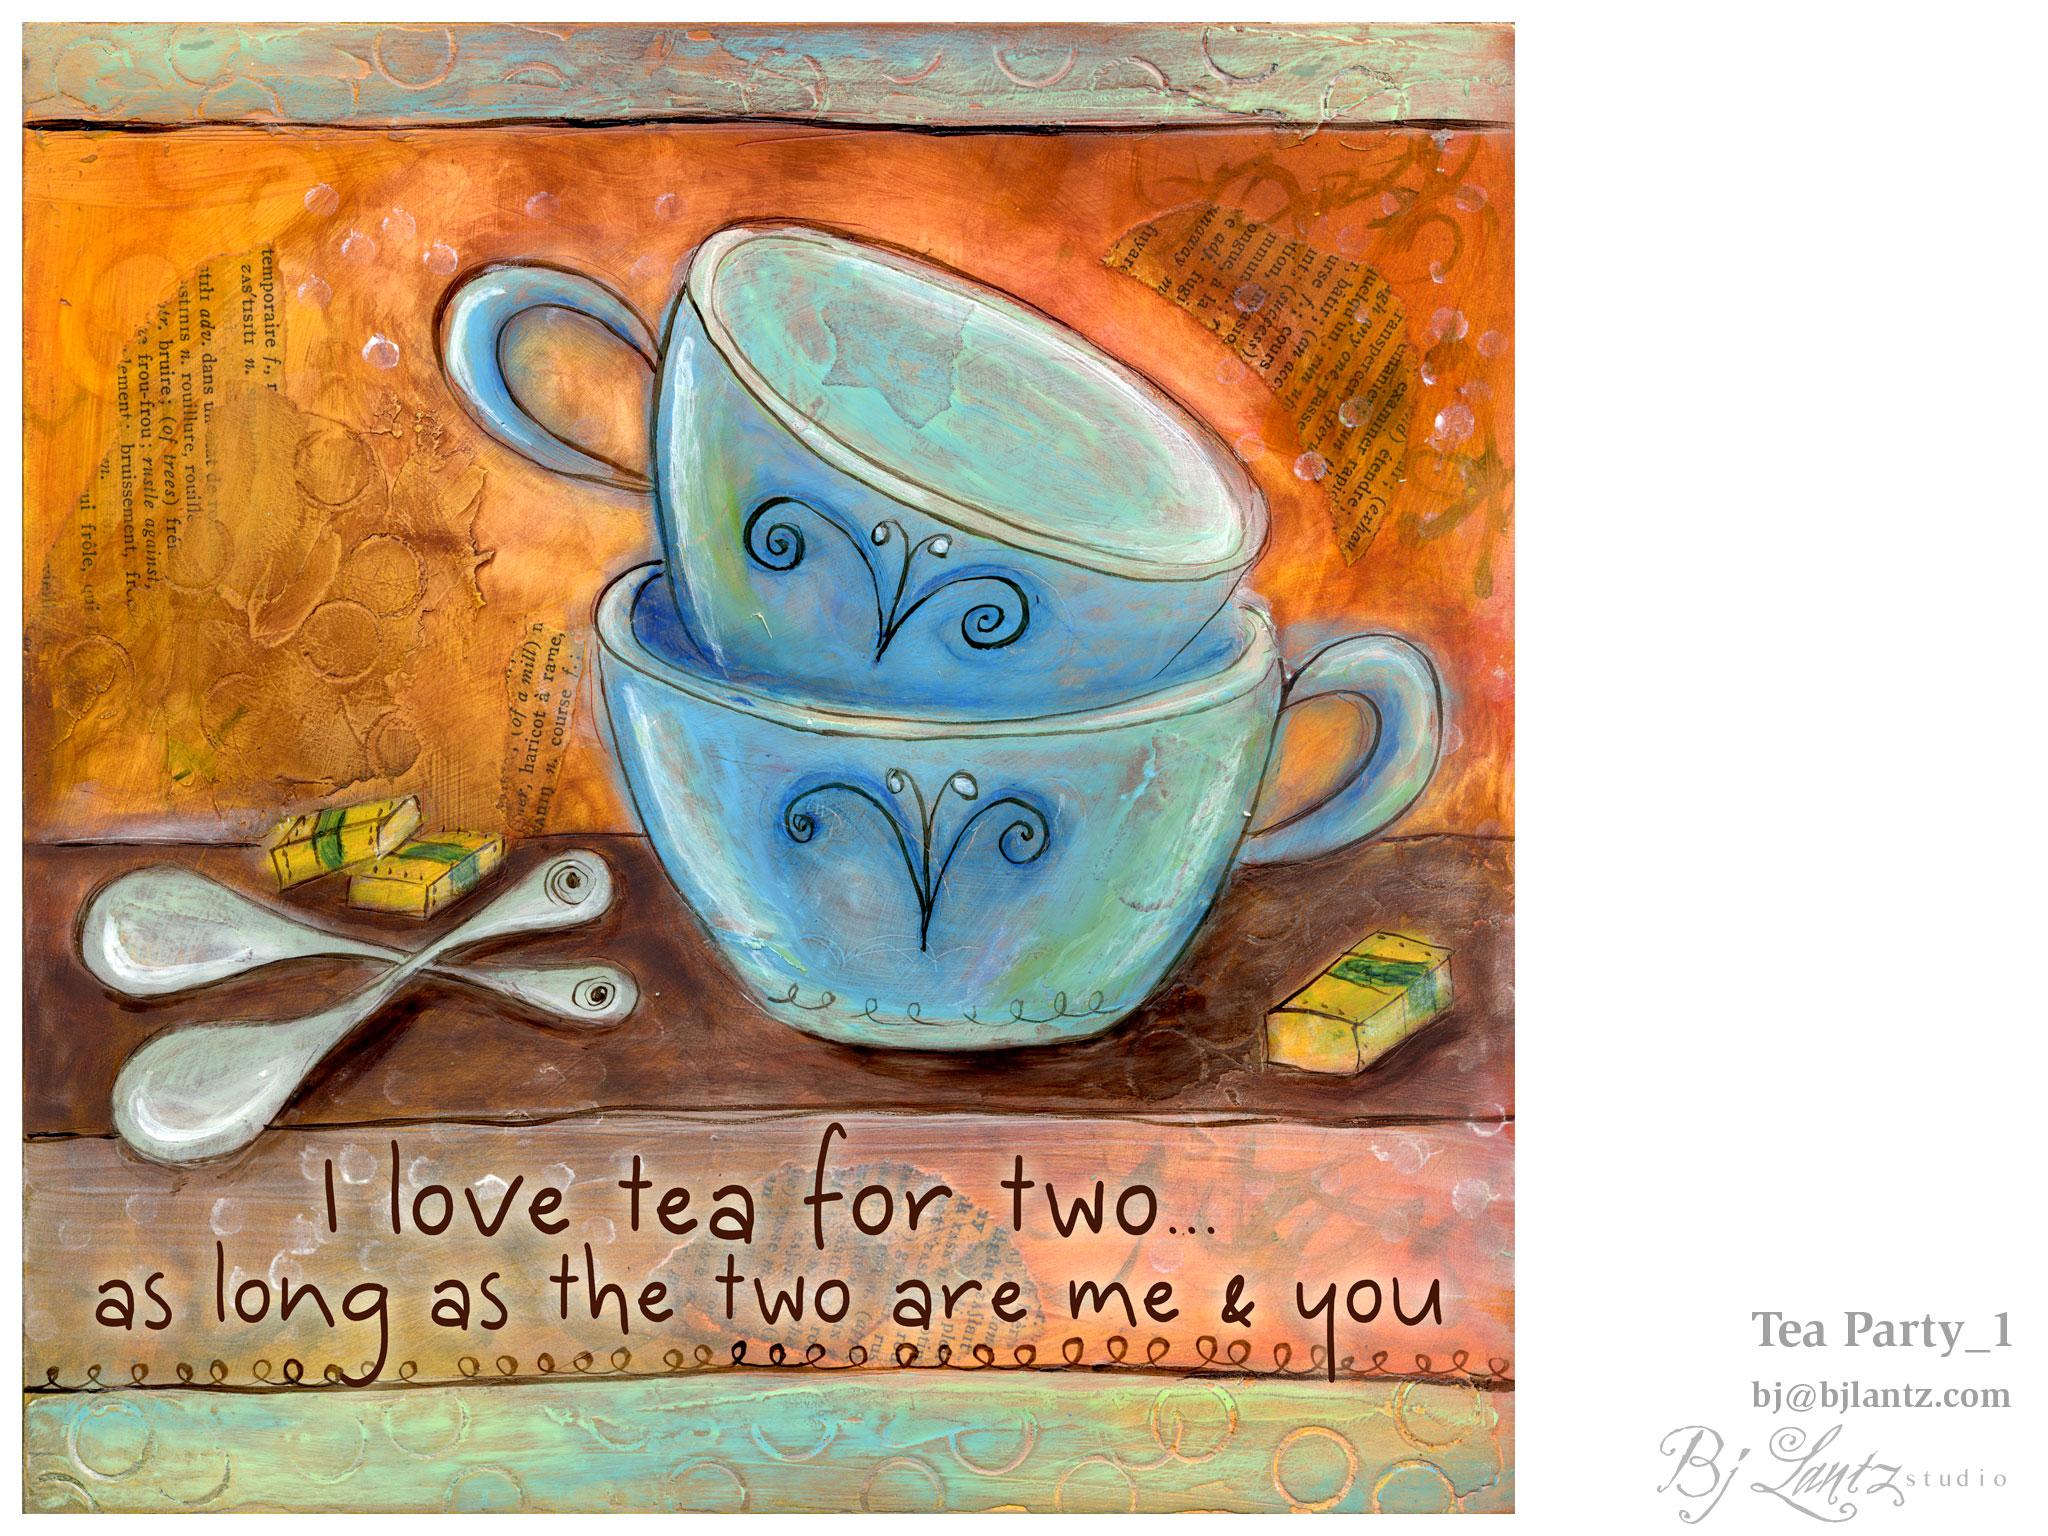 TeaParty_BJLantz_portfolio_1.jpg